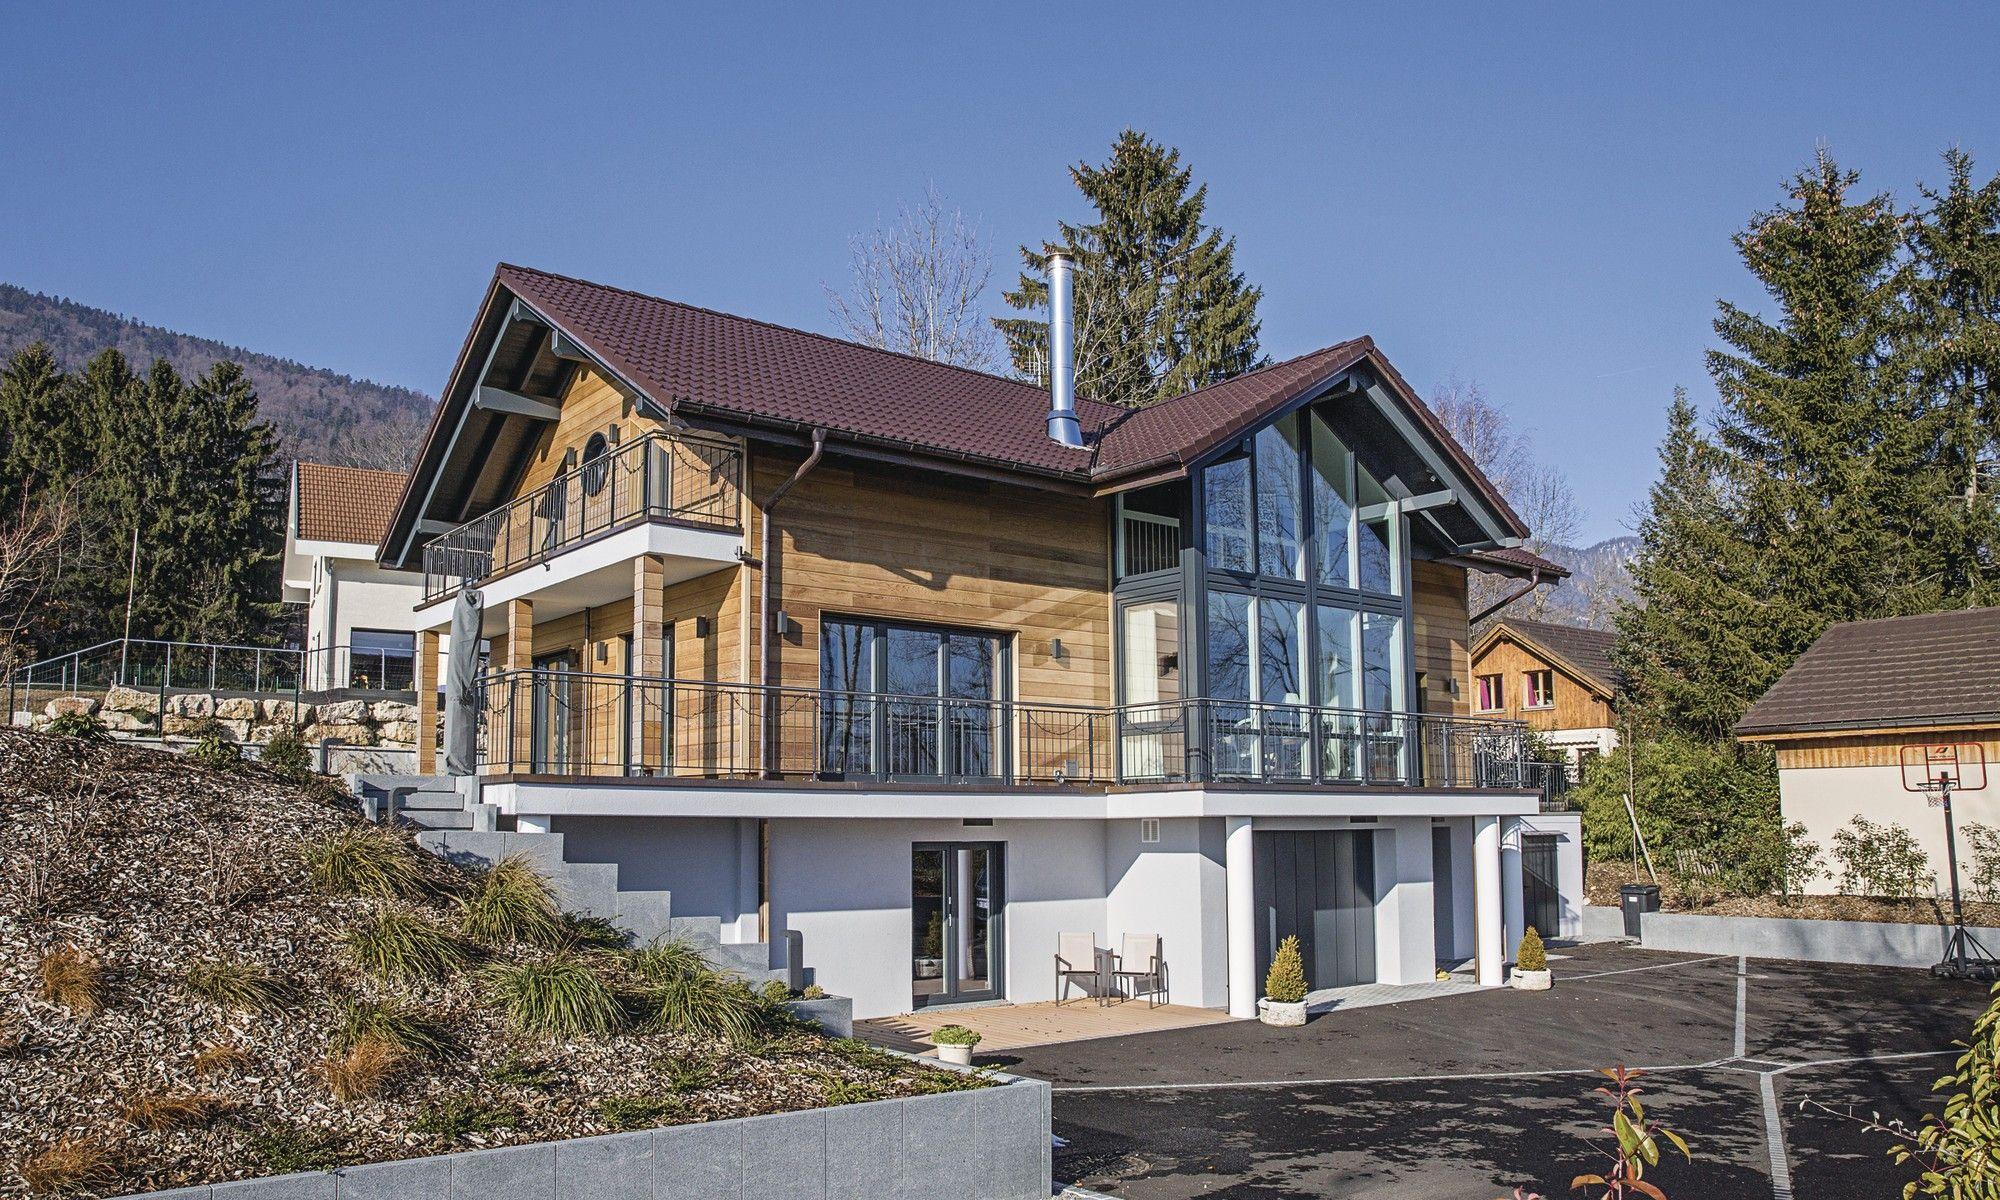 Haus Am Hang Mit Holzverschalung In 2019